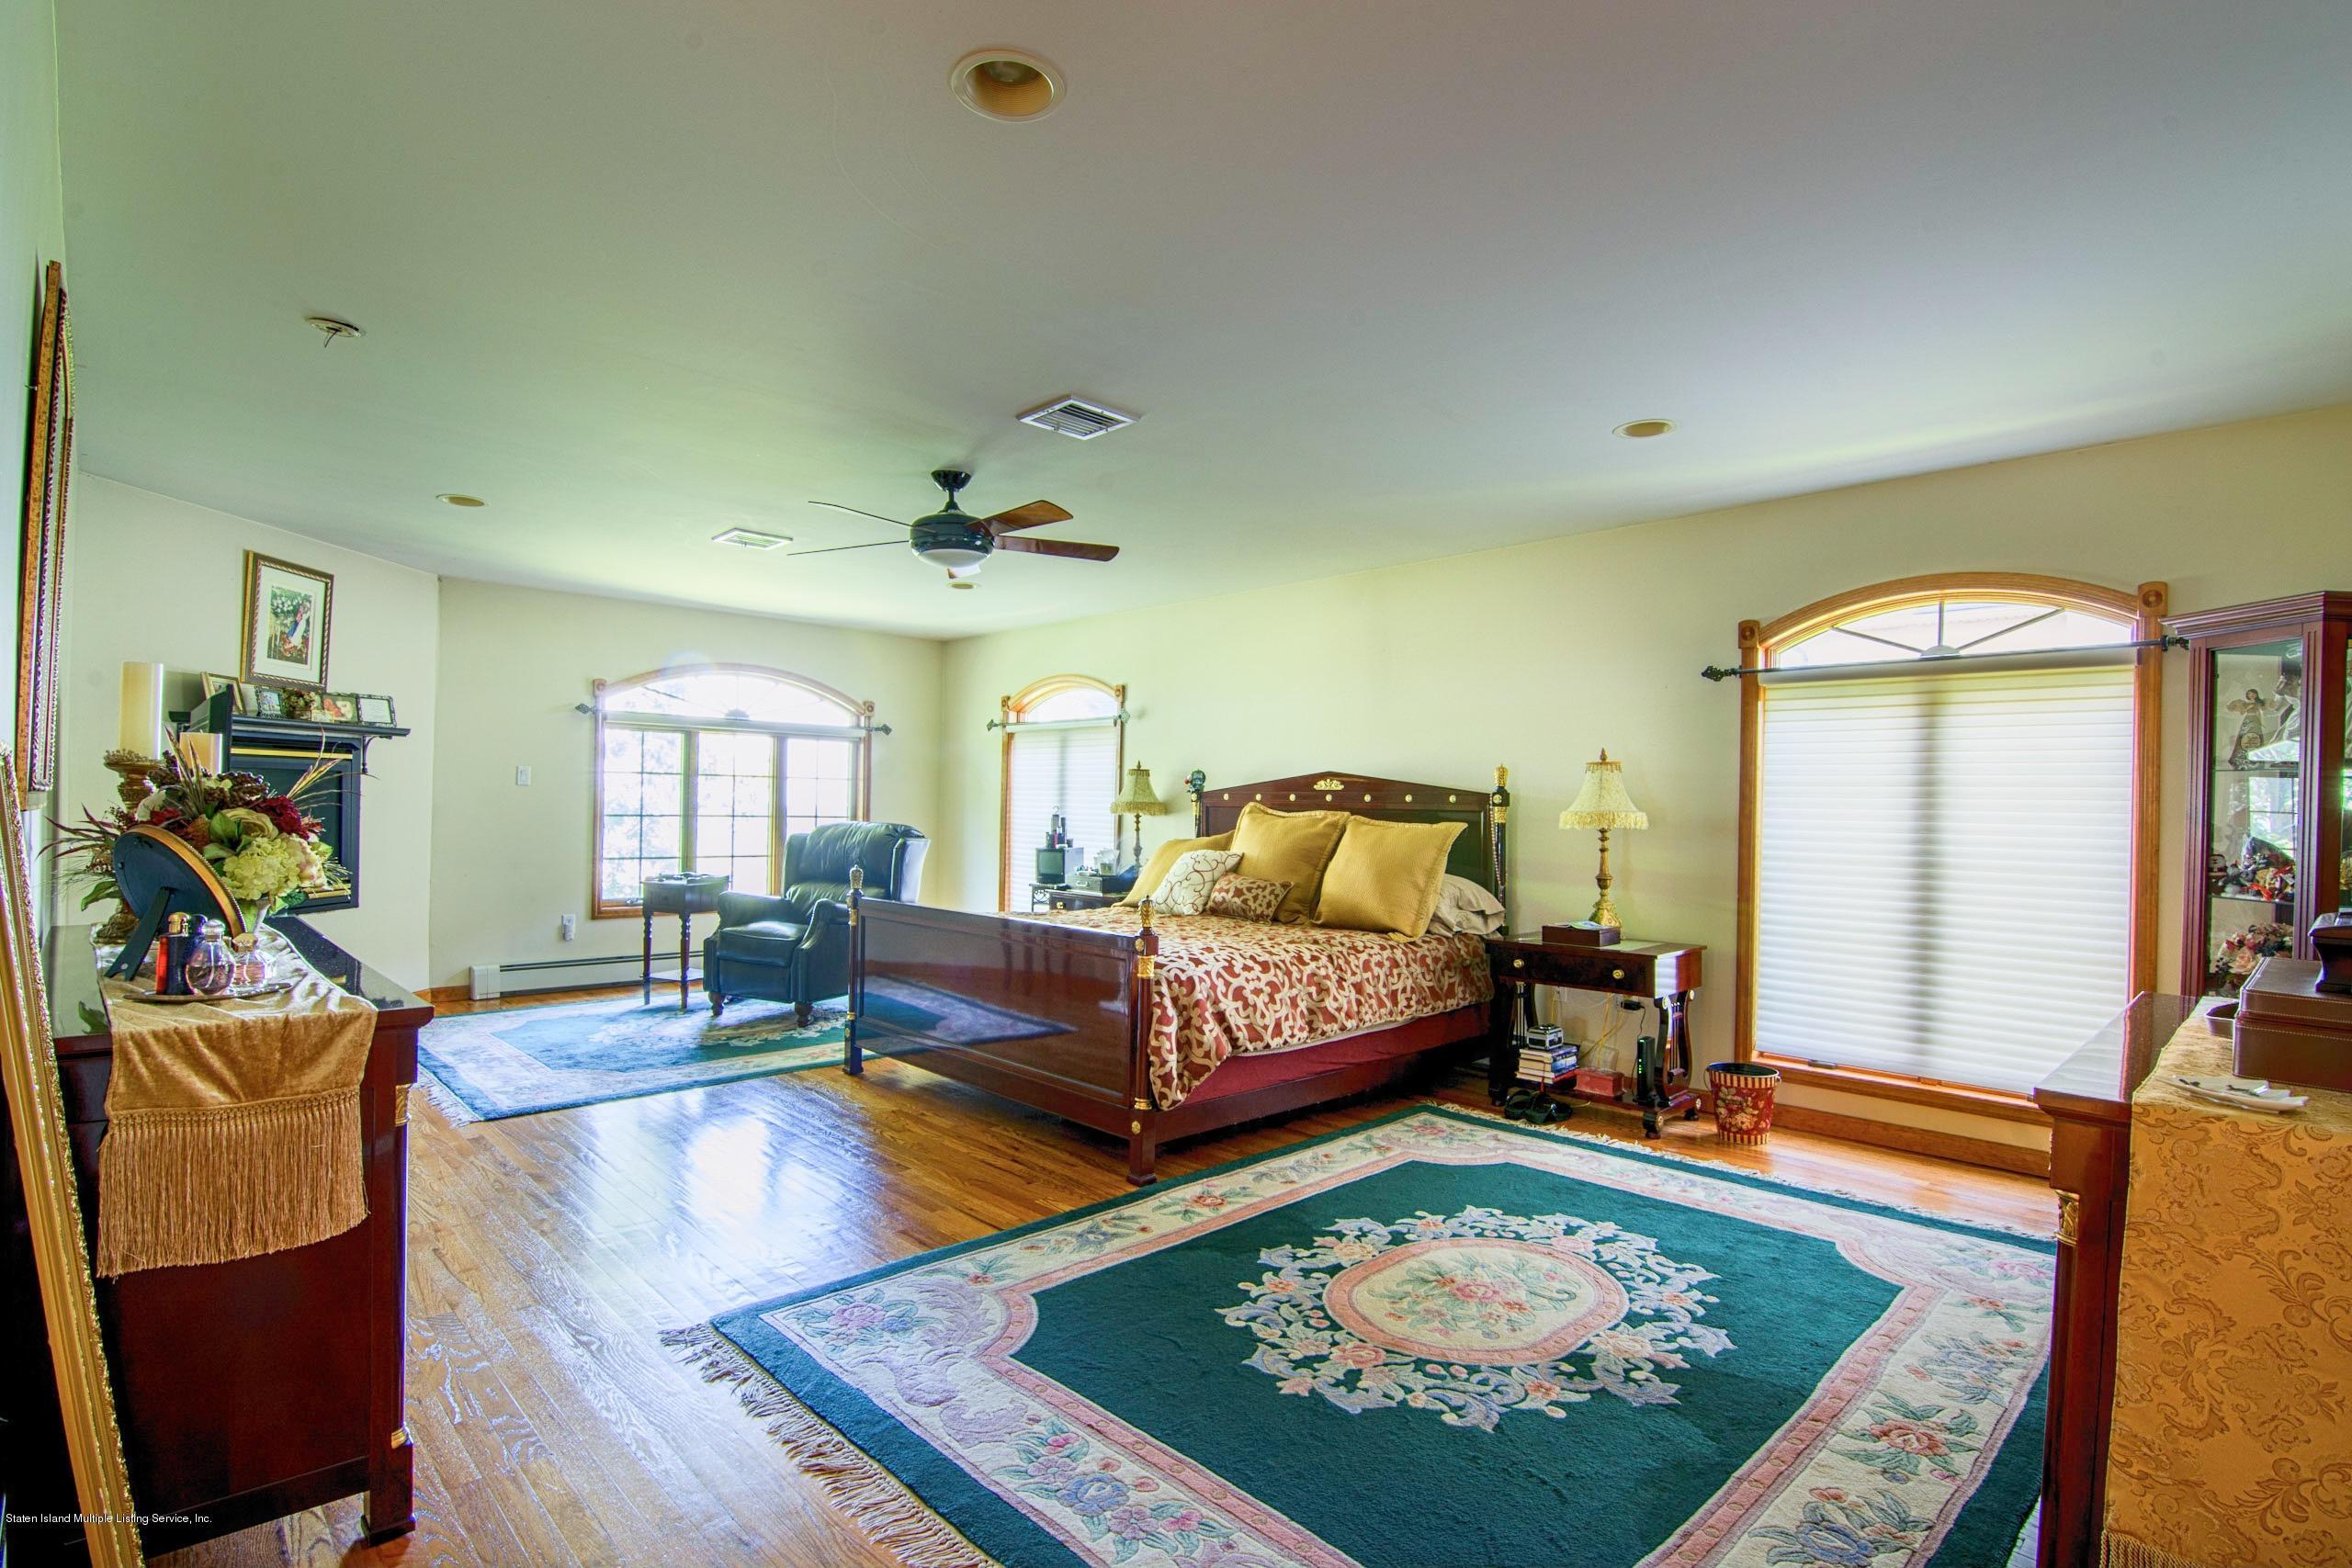 Single Family - Detached 120 Milden Avenue  Staten Island, NY 10301, MLS-1121068-8